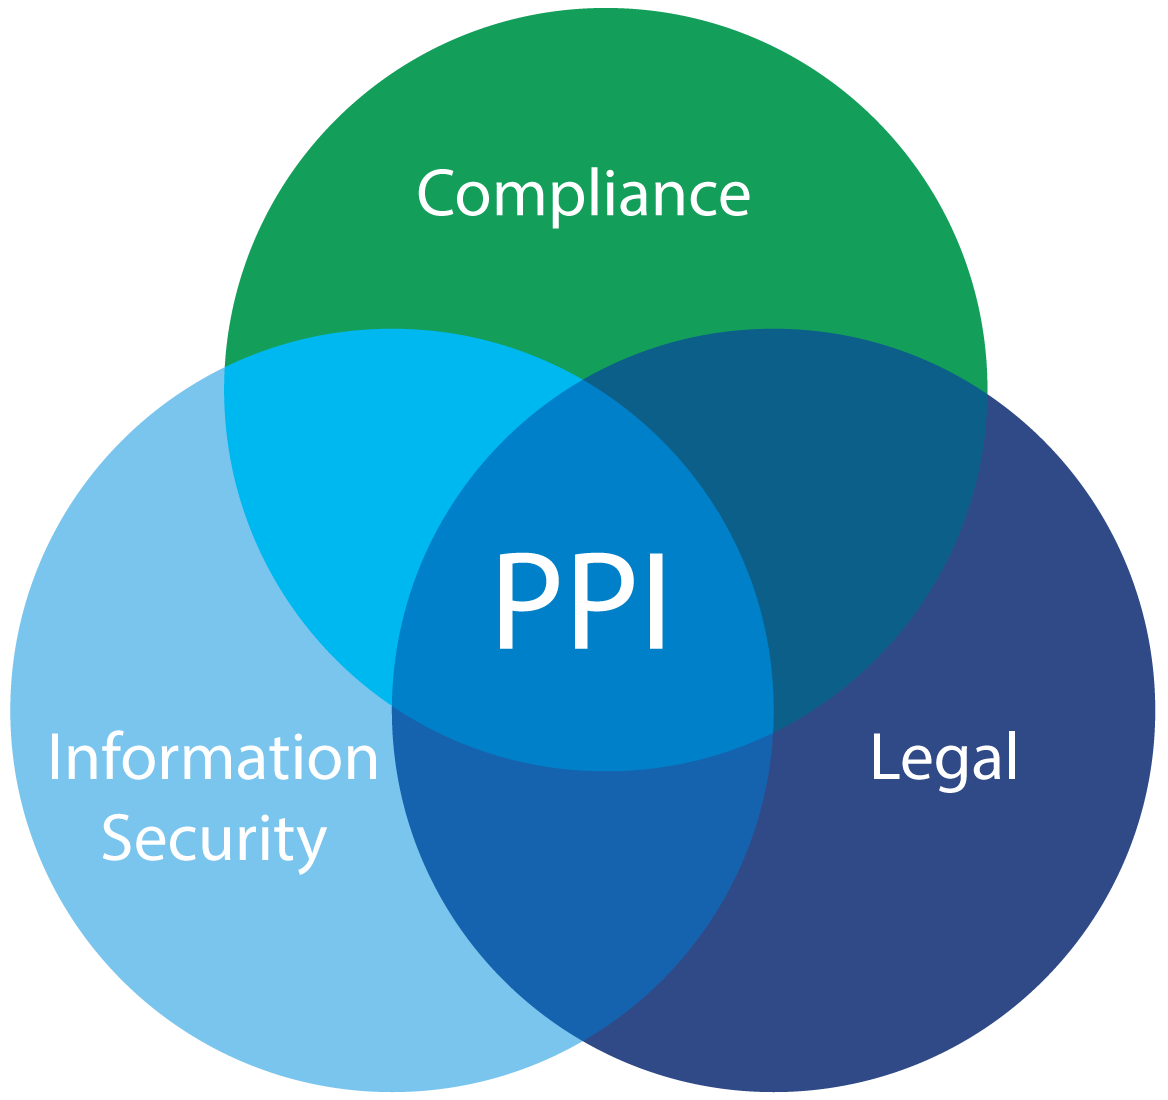 Ppi venn diagram masterword services name ccuart Gallery